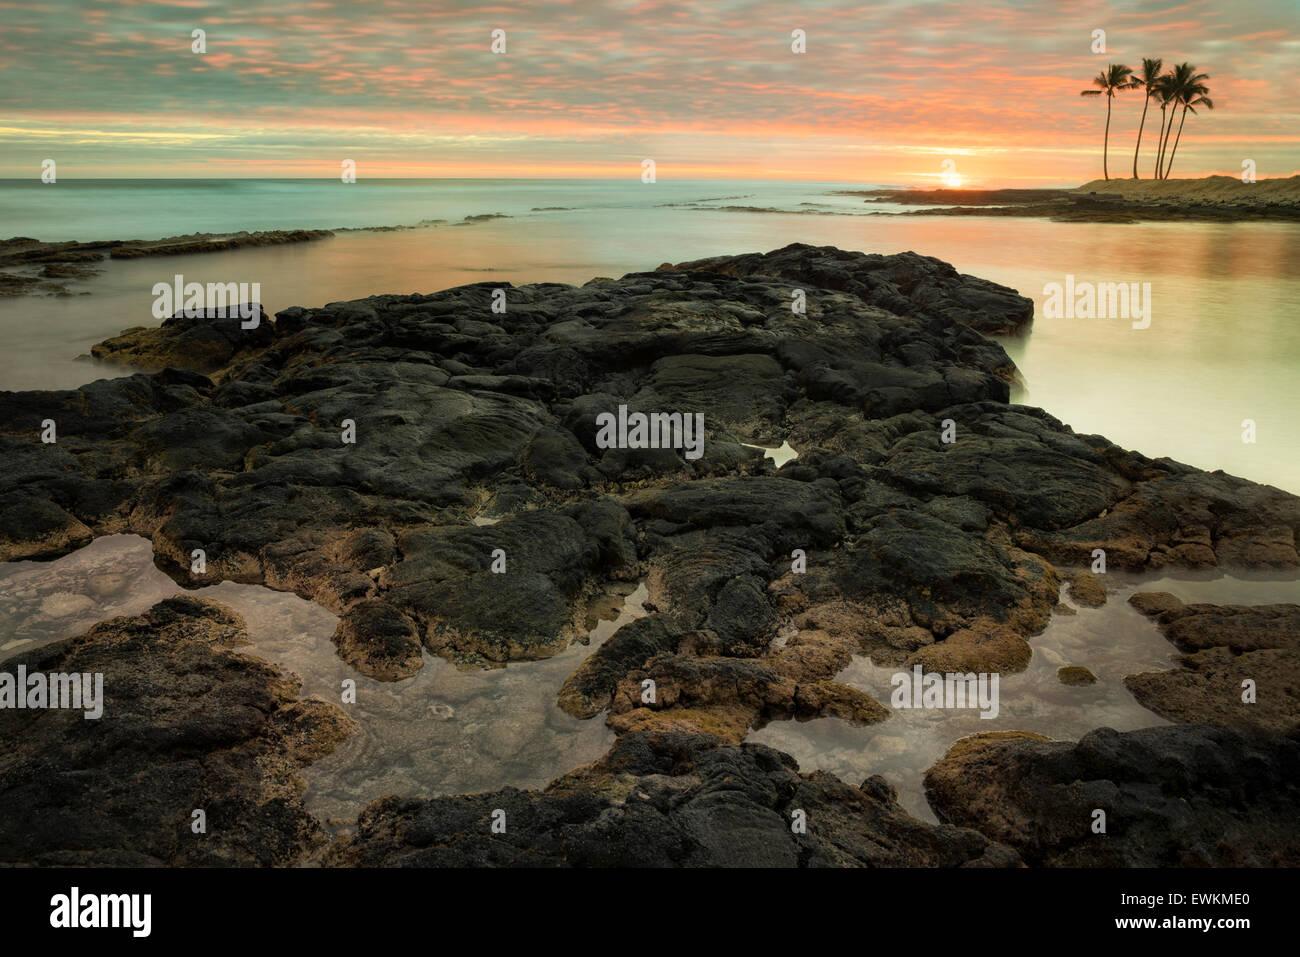 Sunset and palm trees on the Kohala Coast. Hawaii, The Big Island. - Stock Image